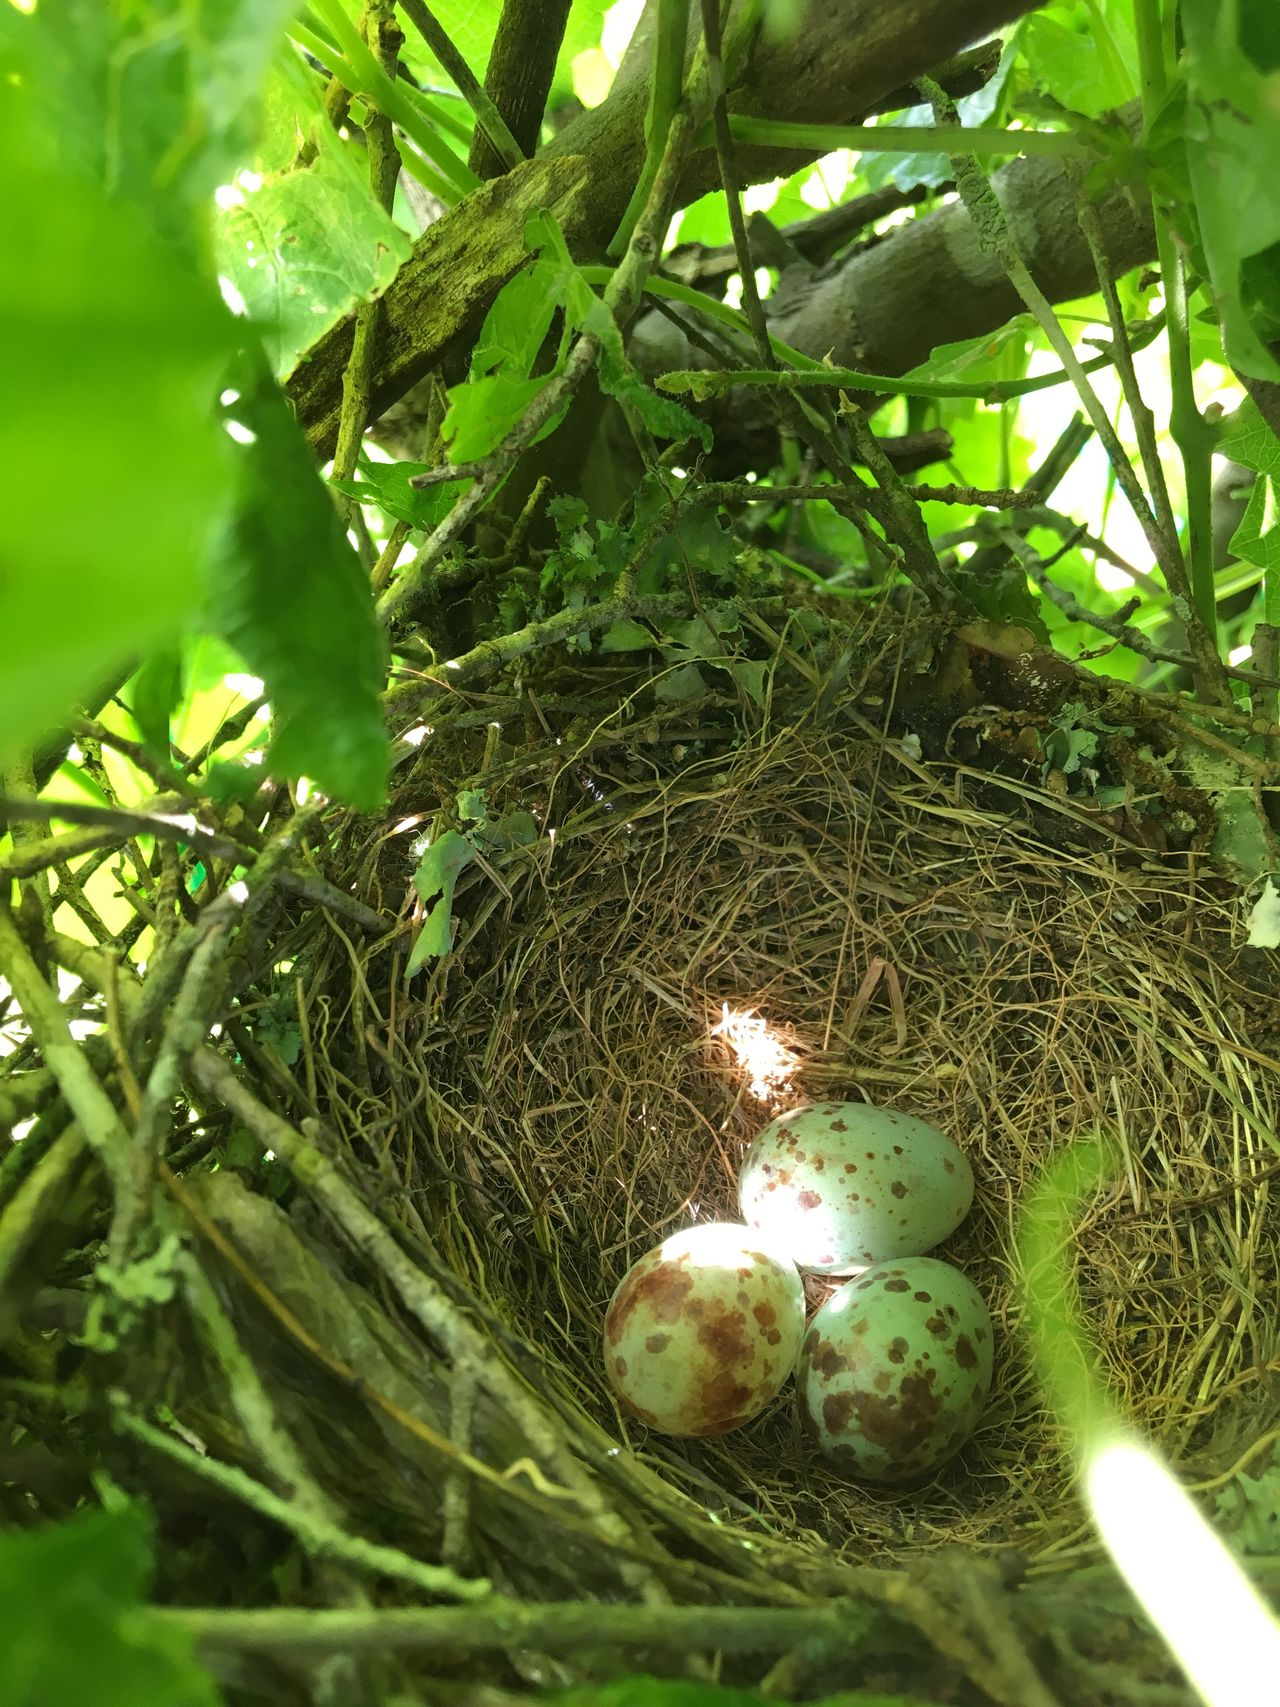 Mockingbird nest New Life Growth Bird Nest Nature Beginnings Green Color Fragility Leaf Outdoors Day Sunlight Through Leaves dappled sun Green Light Beauty In Nature IPhone Photography